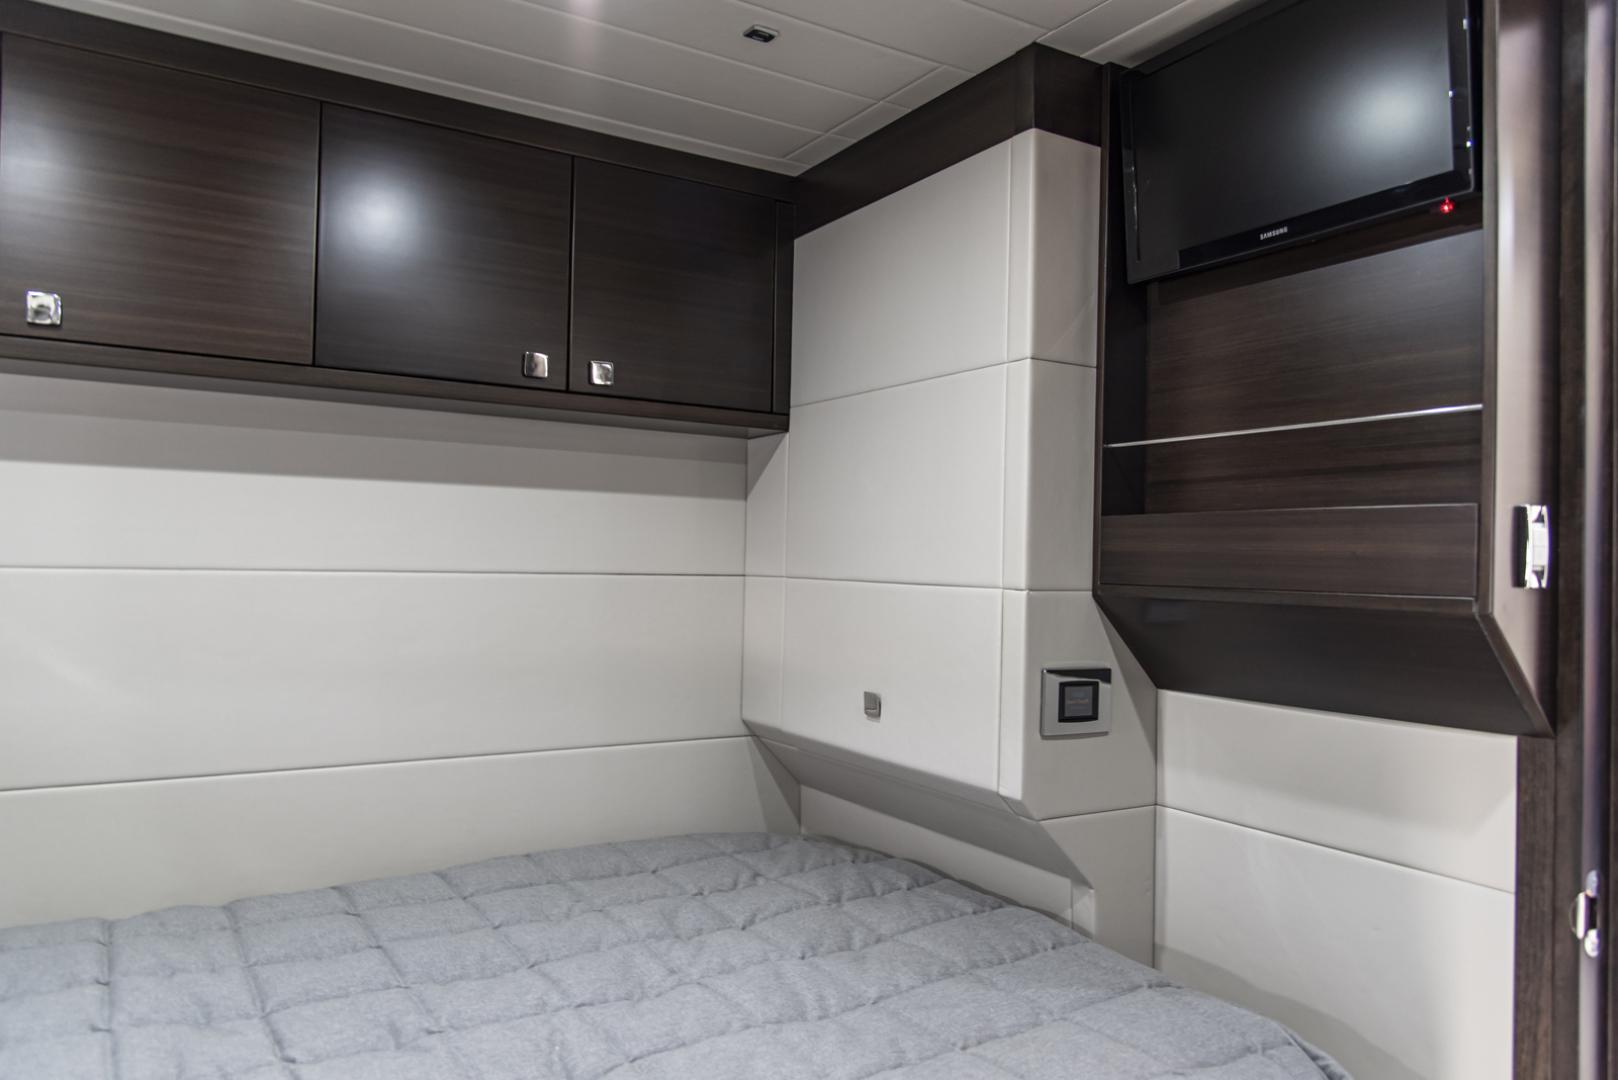 Neptunus-Motor Yacht Express 2018-LIQUID WISDOM Grand Haven-Michigan-United States-Stbd guest cabin looking inboard-1484991 | Thumbnail